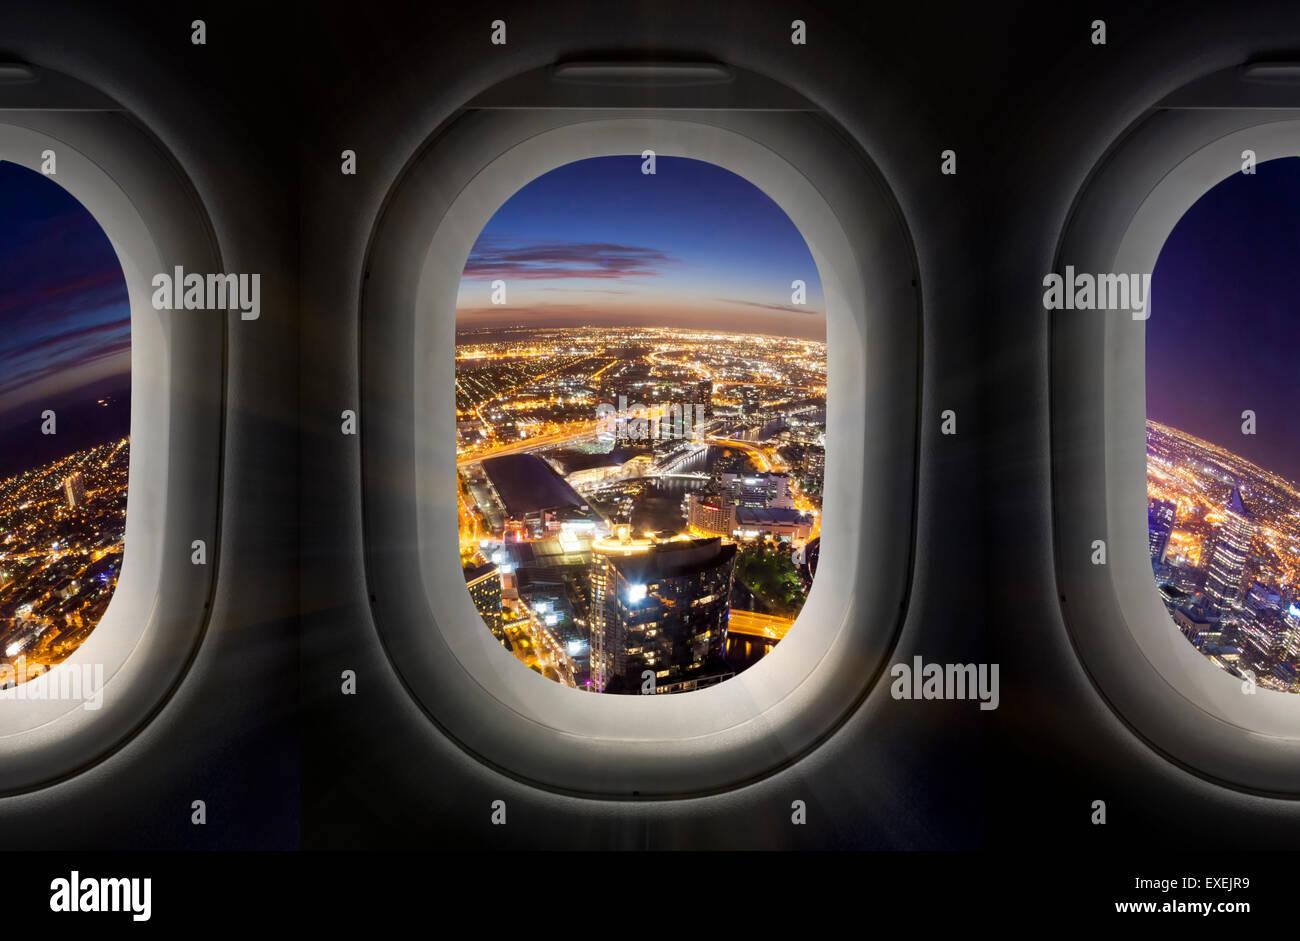 City At Night Through Airplane Window Stock Photo Alamy